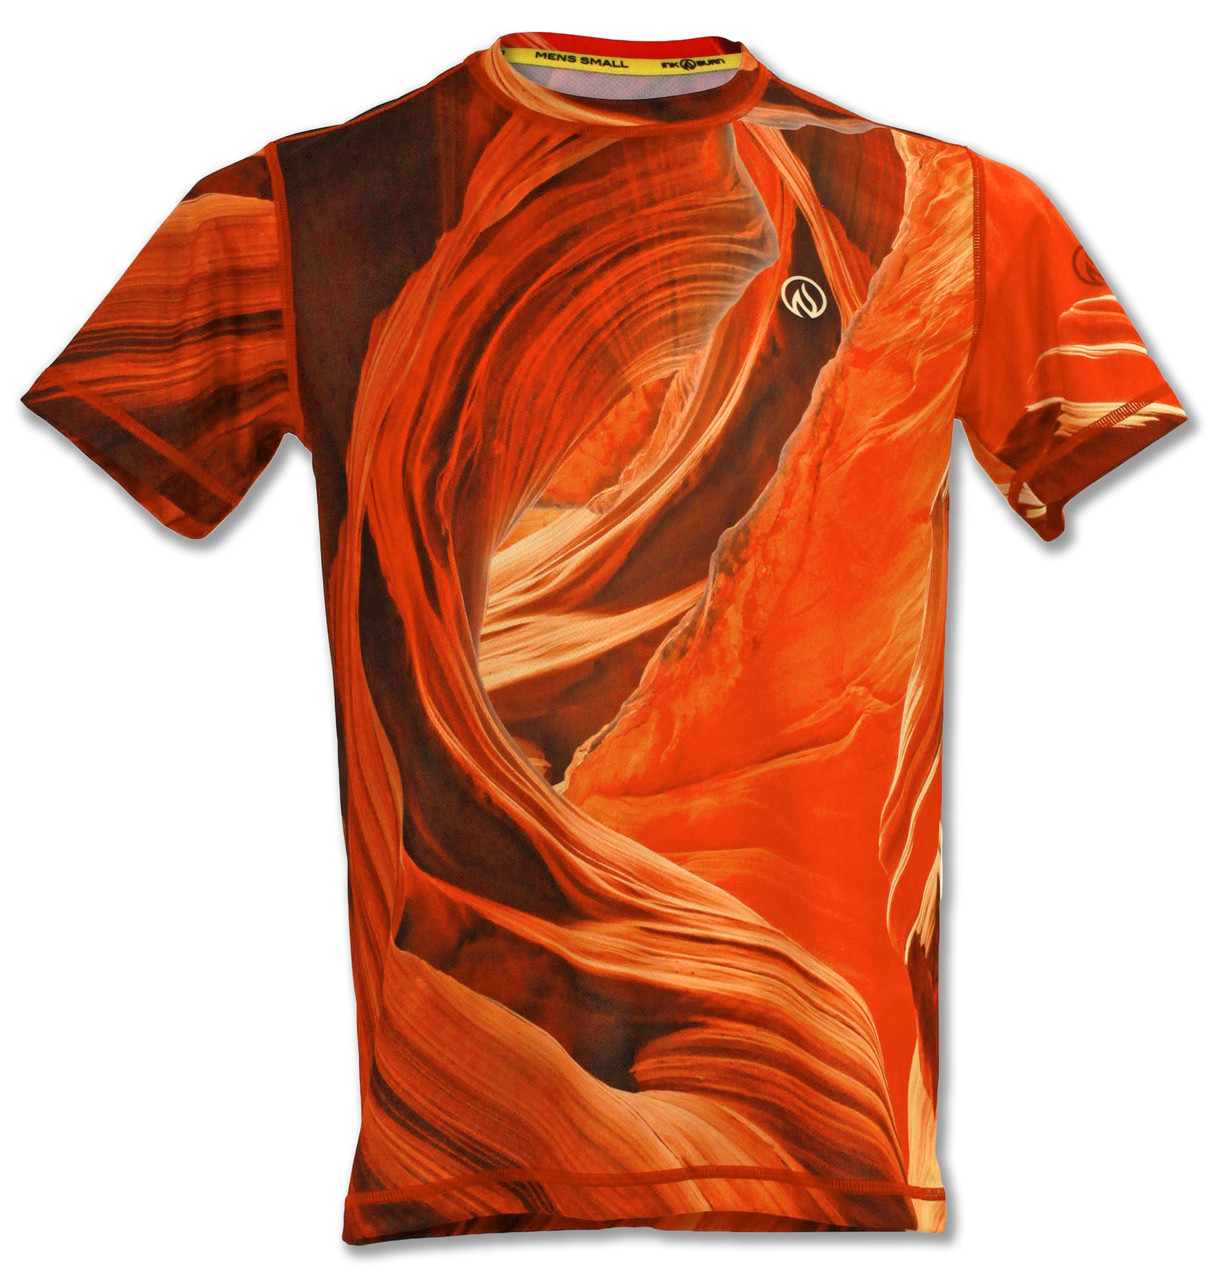 INKnBURN Men's Sandstone Tech Shirt Front